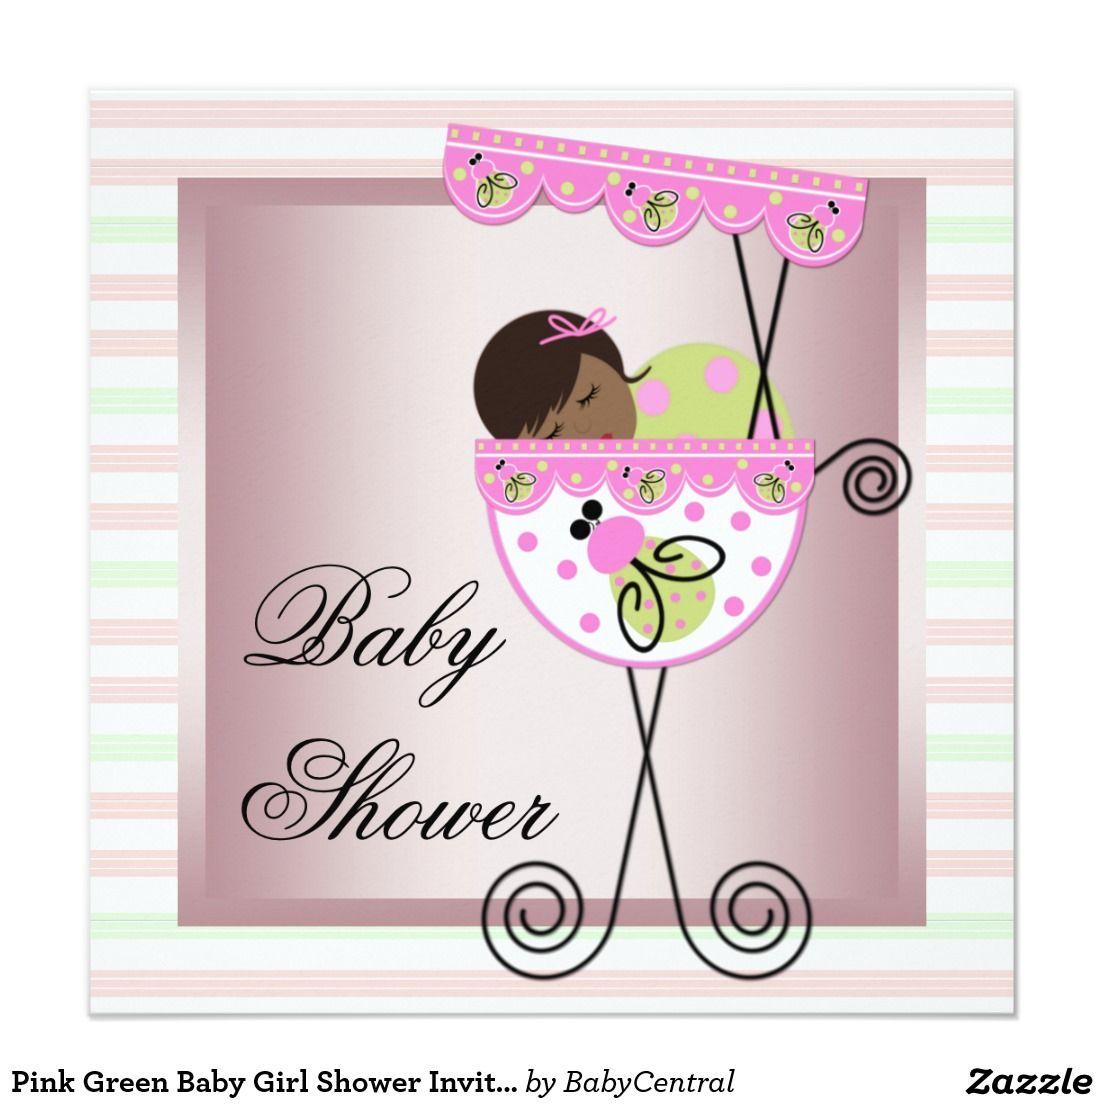 Pink Green Baby Girl Shower Invitations   Baby girl shower, Shower ...